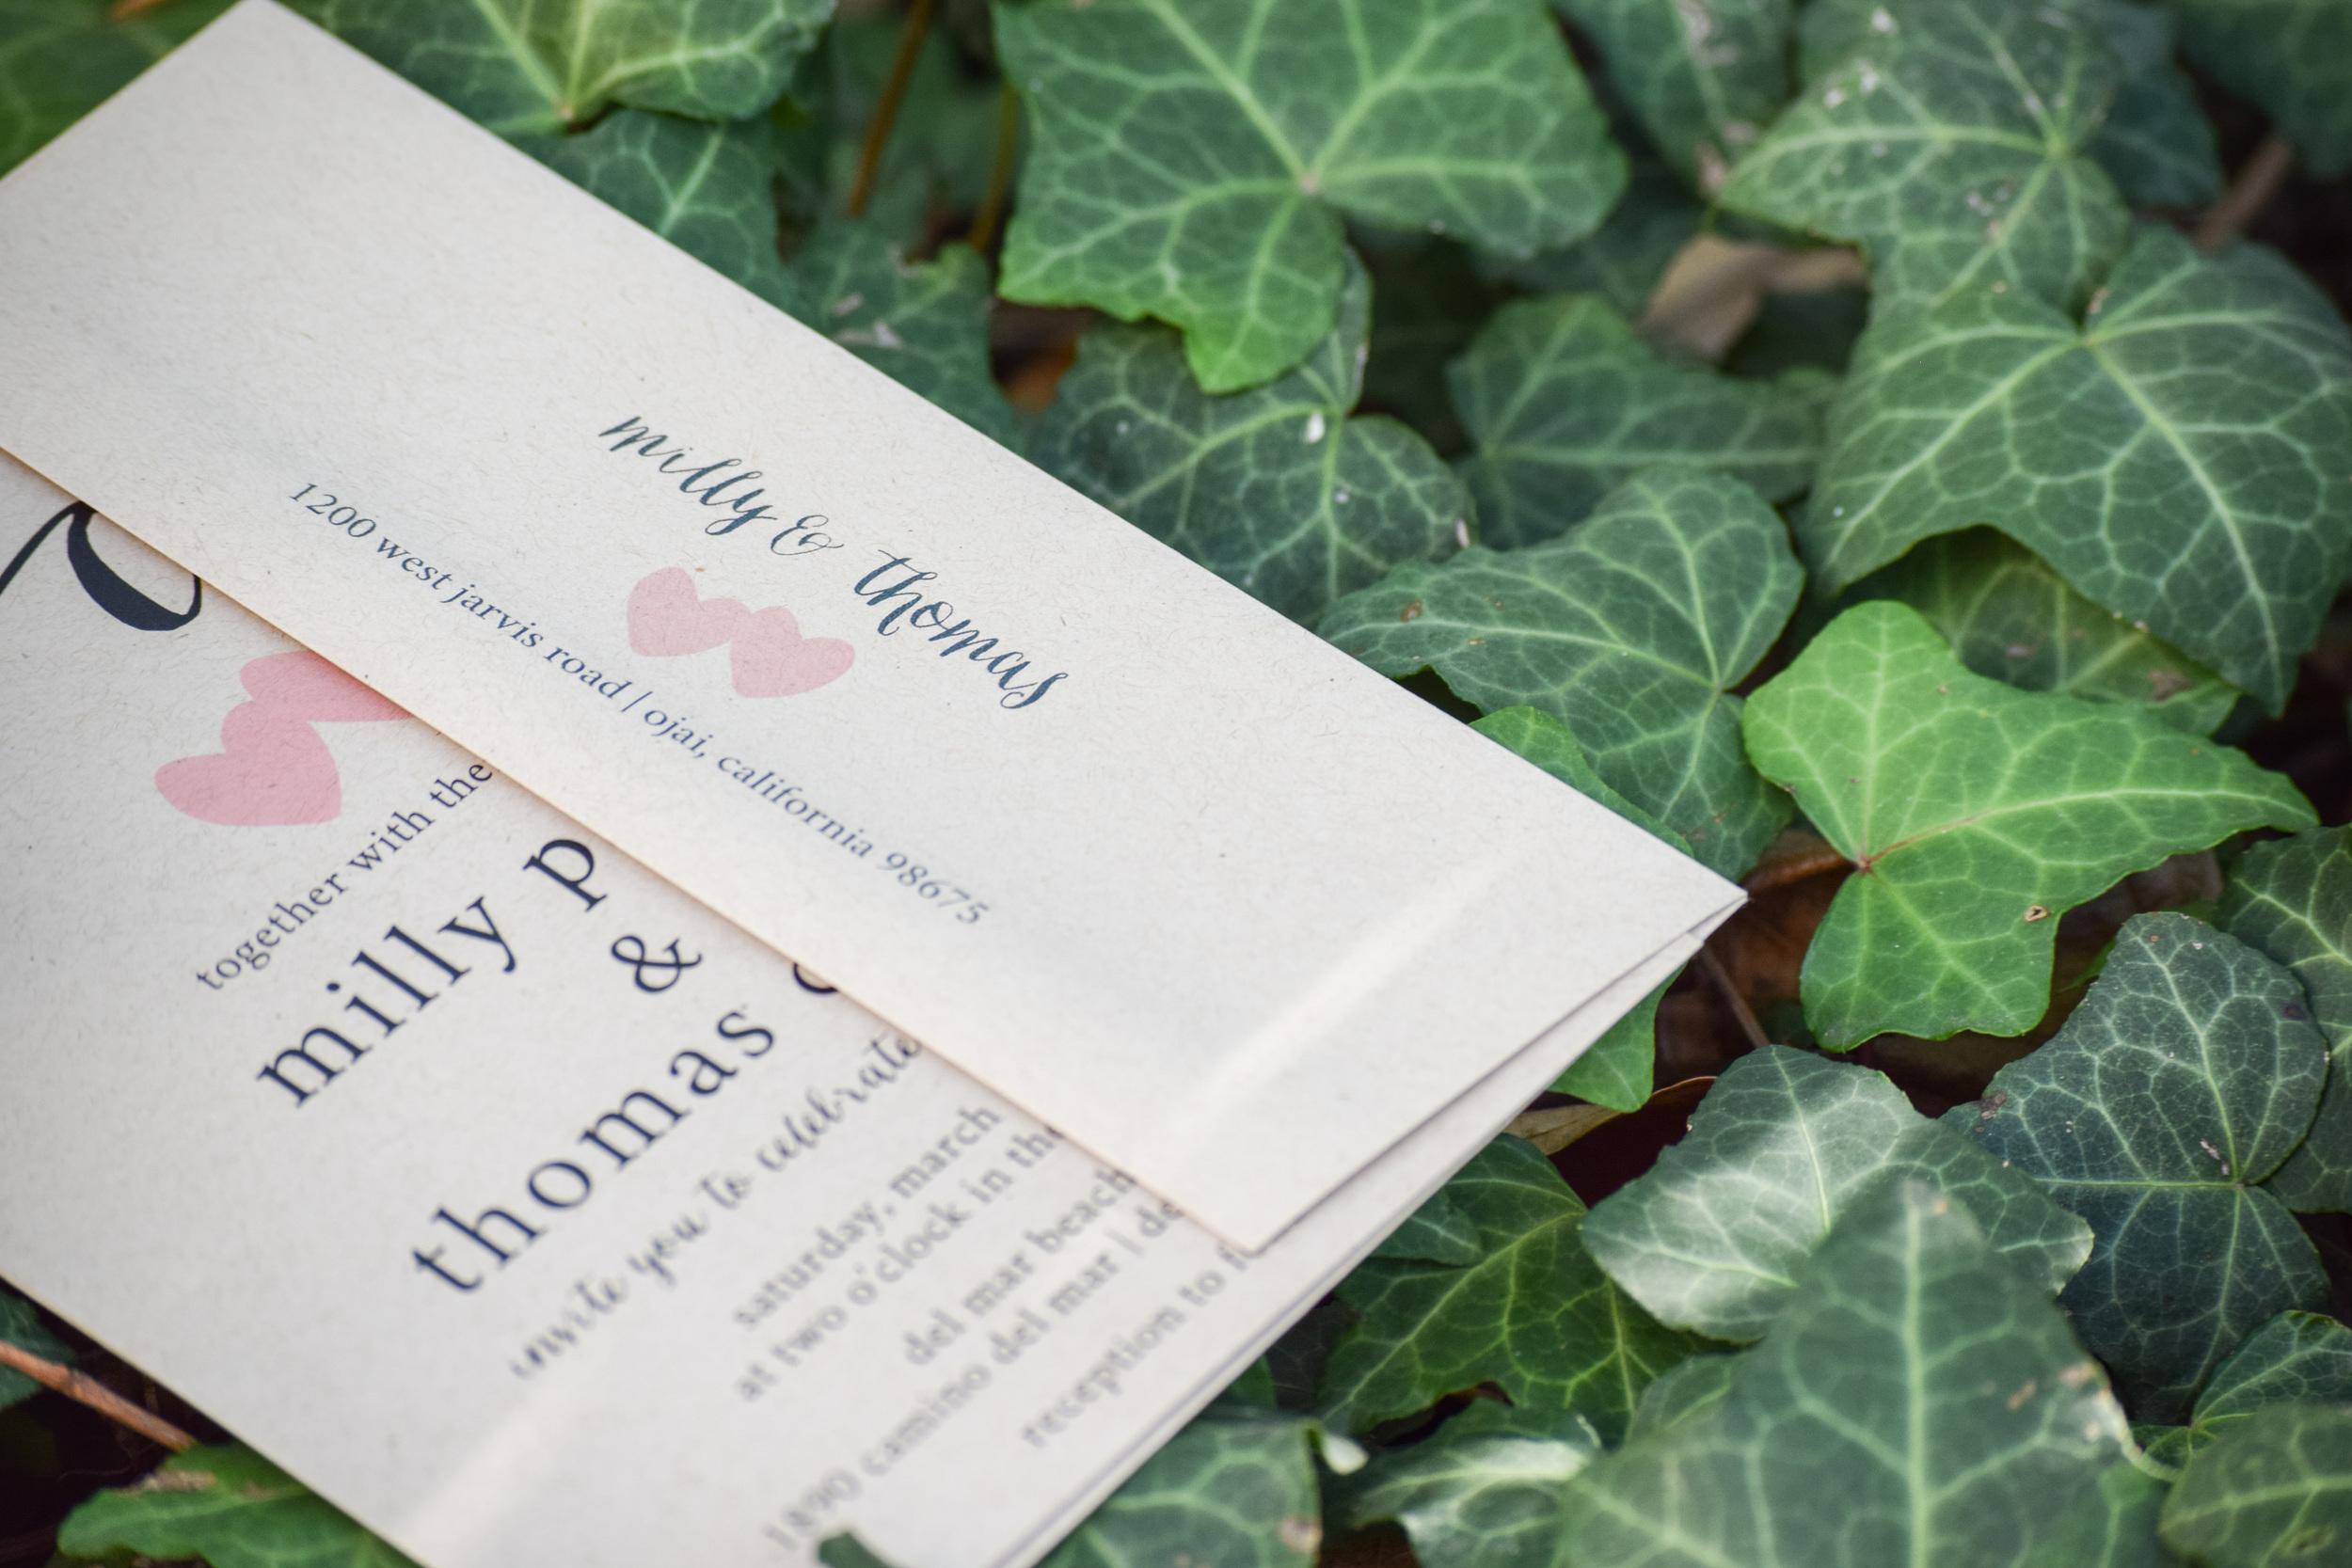 Rustic Kraft Paper Wedding Invitation Suite by Paper Hive